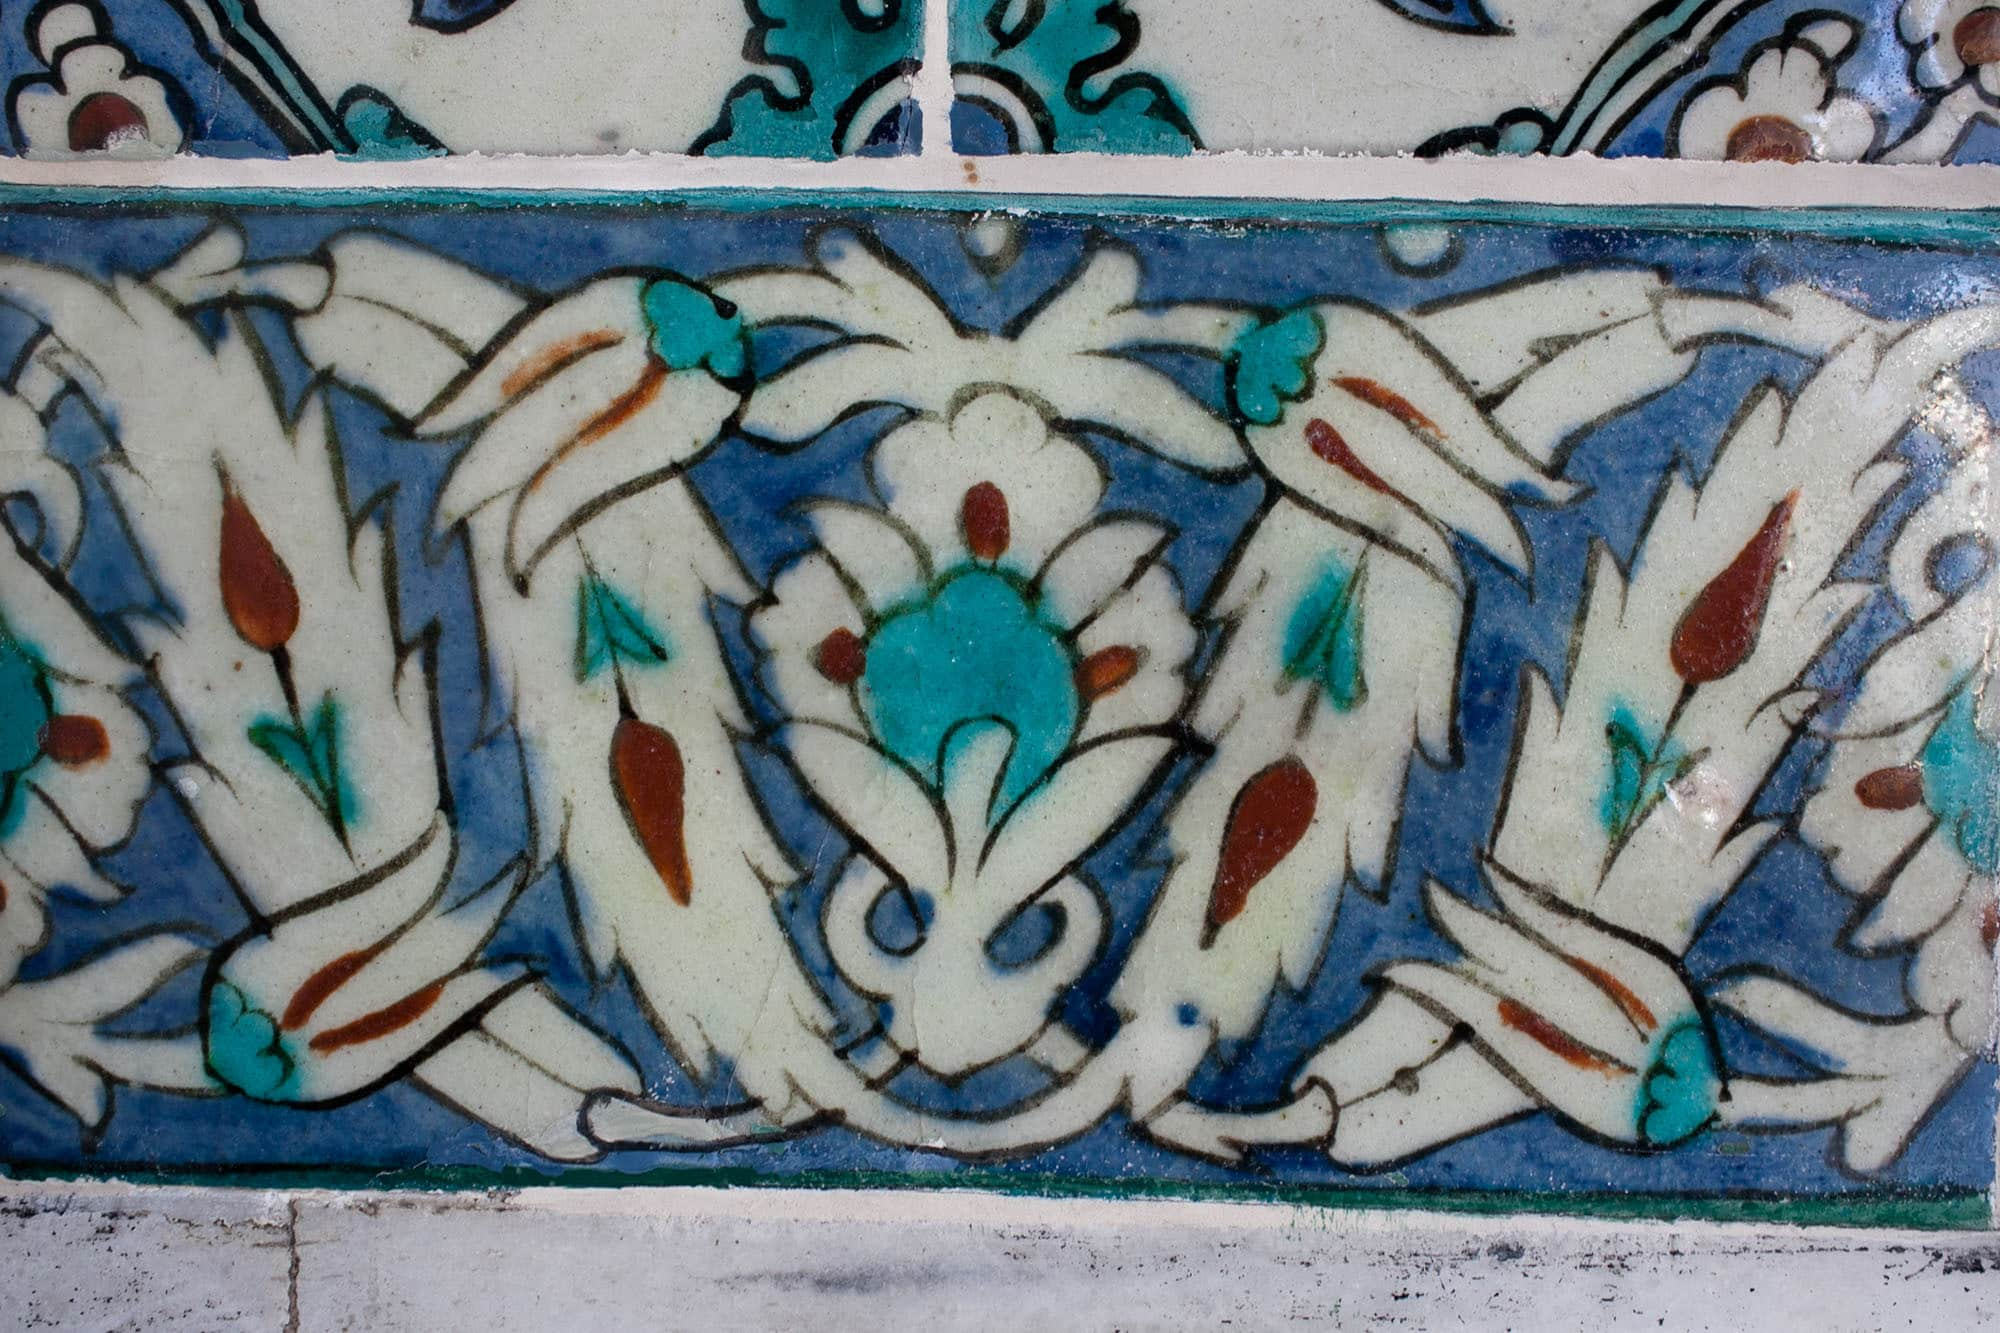 Mosaics and tile work in Topkapi Sarayi in Istanbul, Turkey